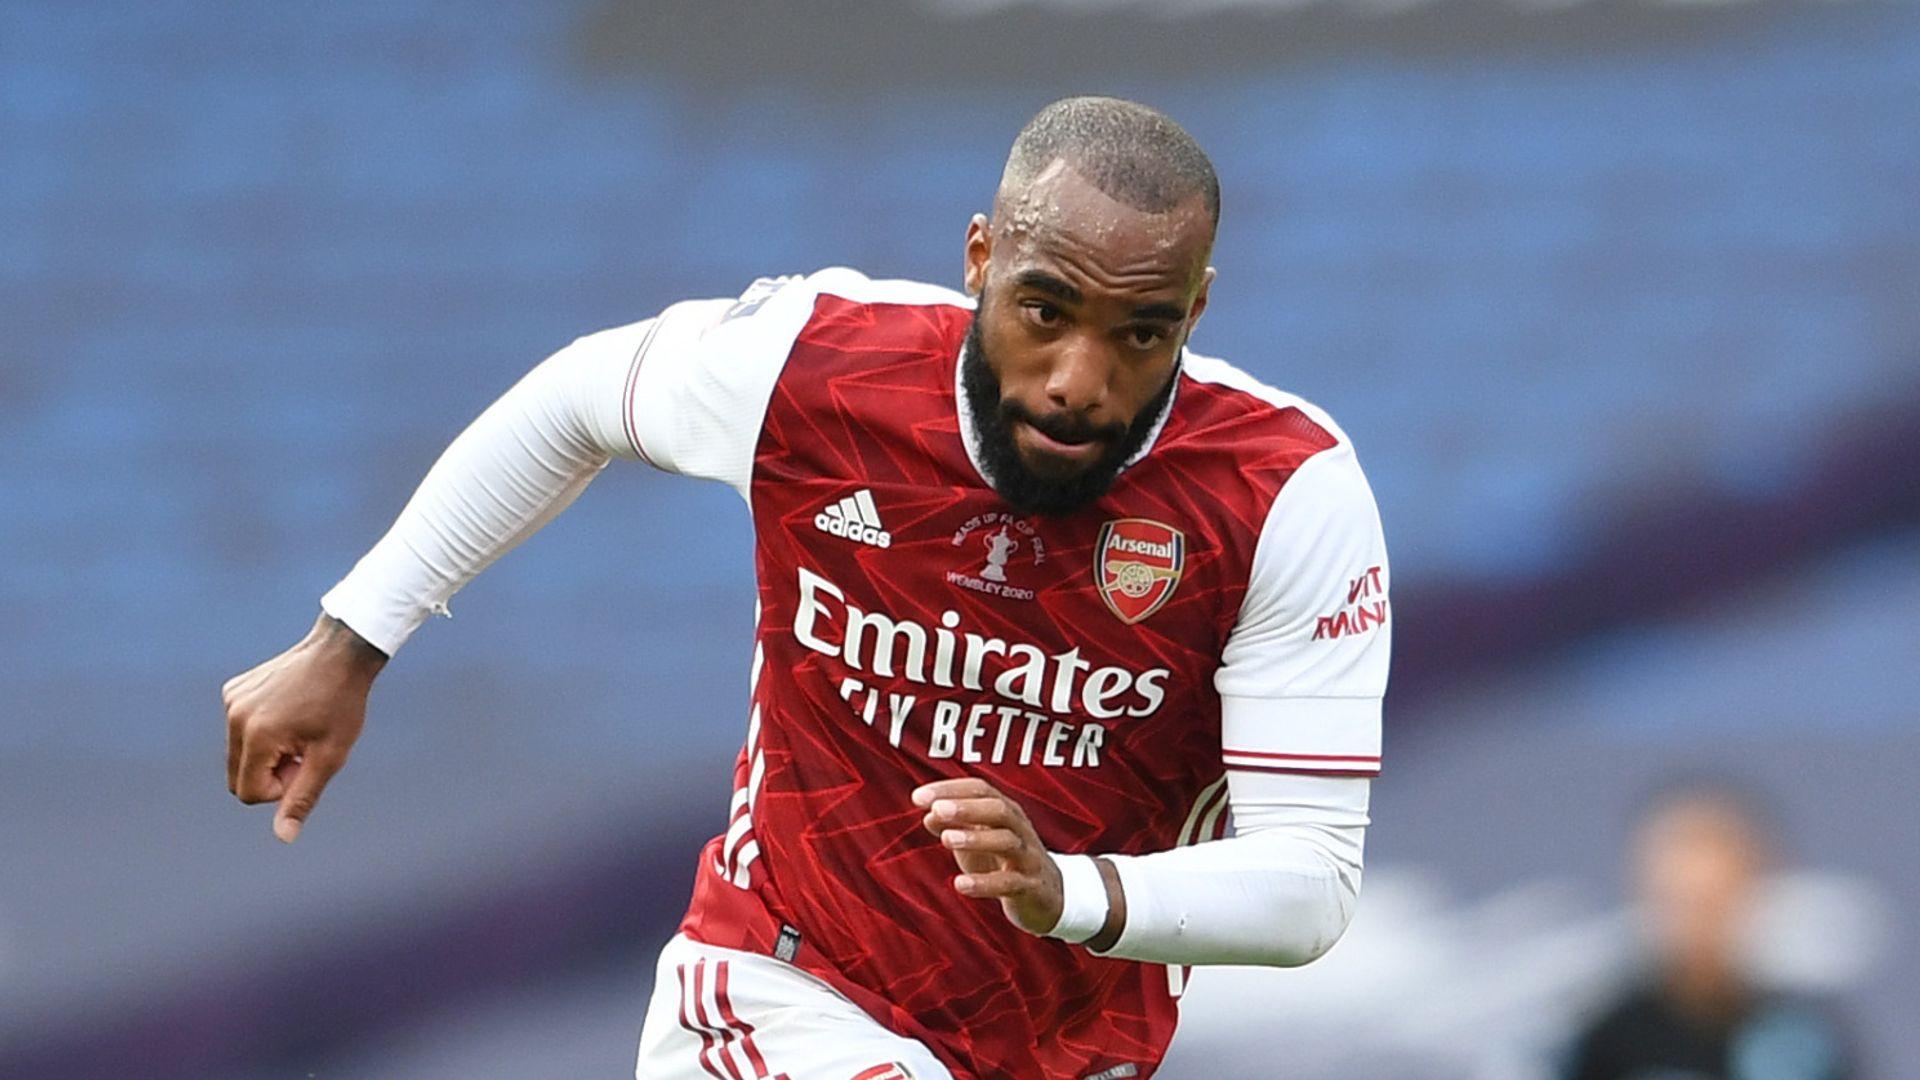 Transfer Show: Could Arsenal swap Lacazette for Partey?